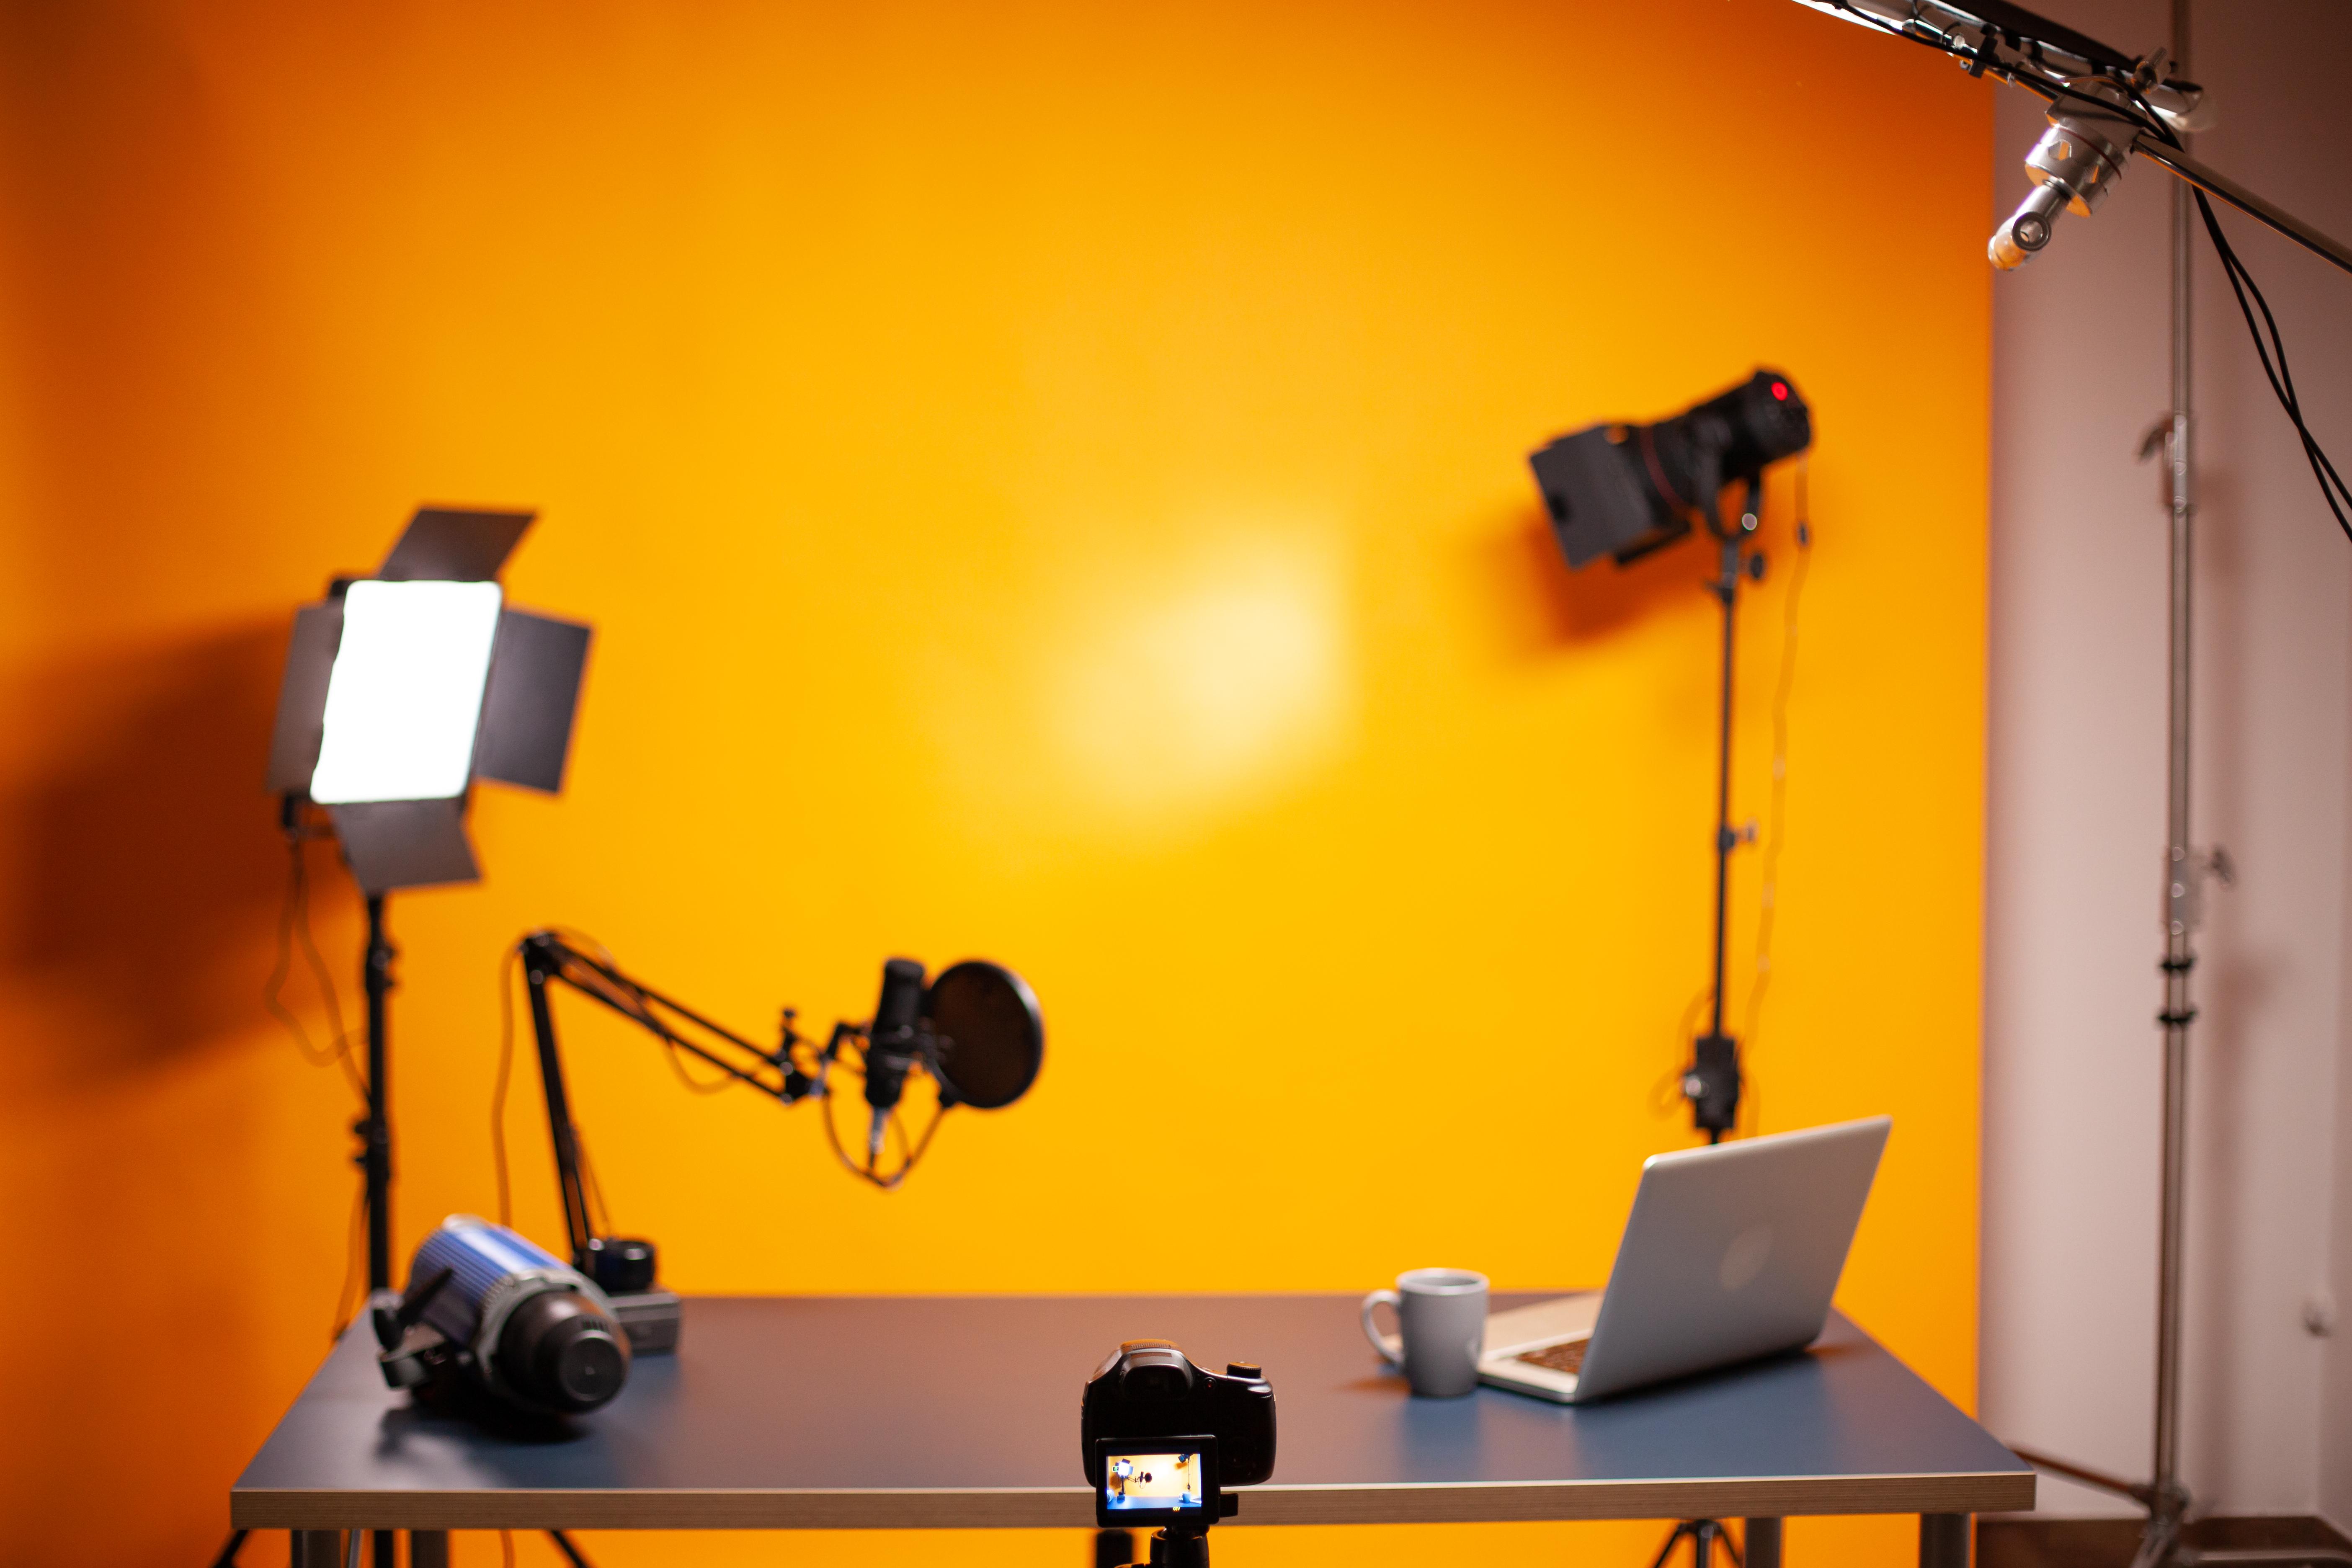 professional-podcast-vlogging-setup-studio-with-yellow-wall.jpg